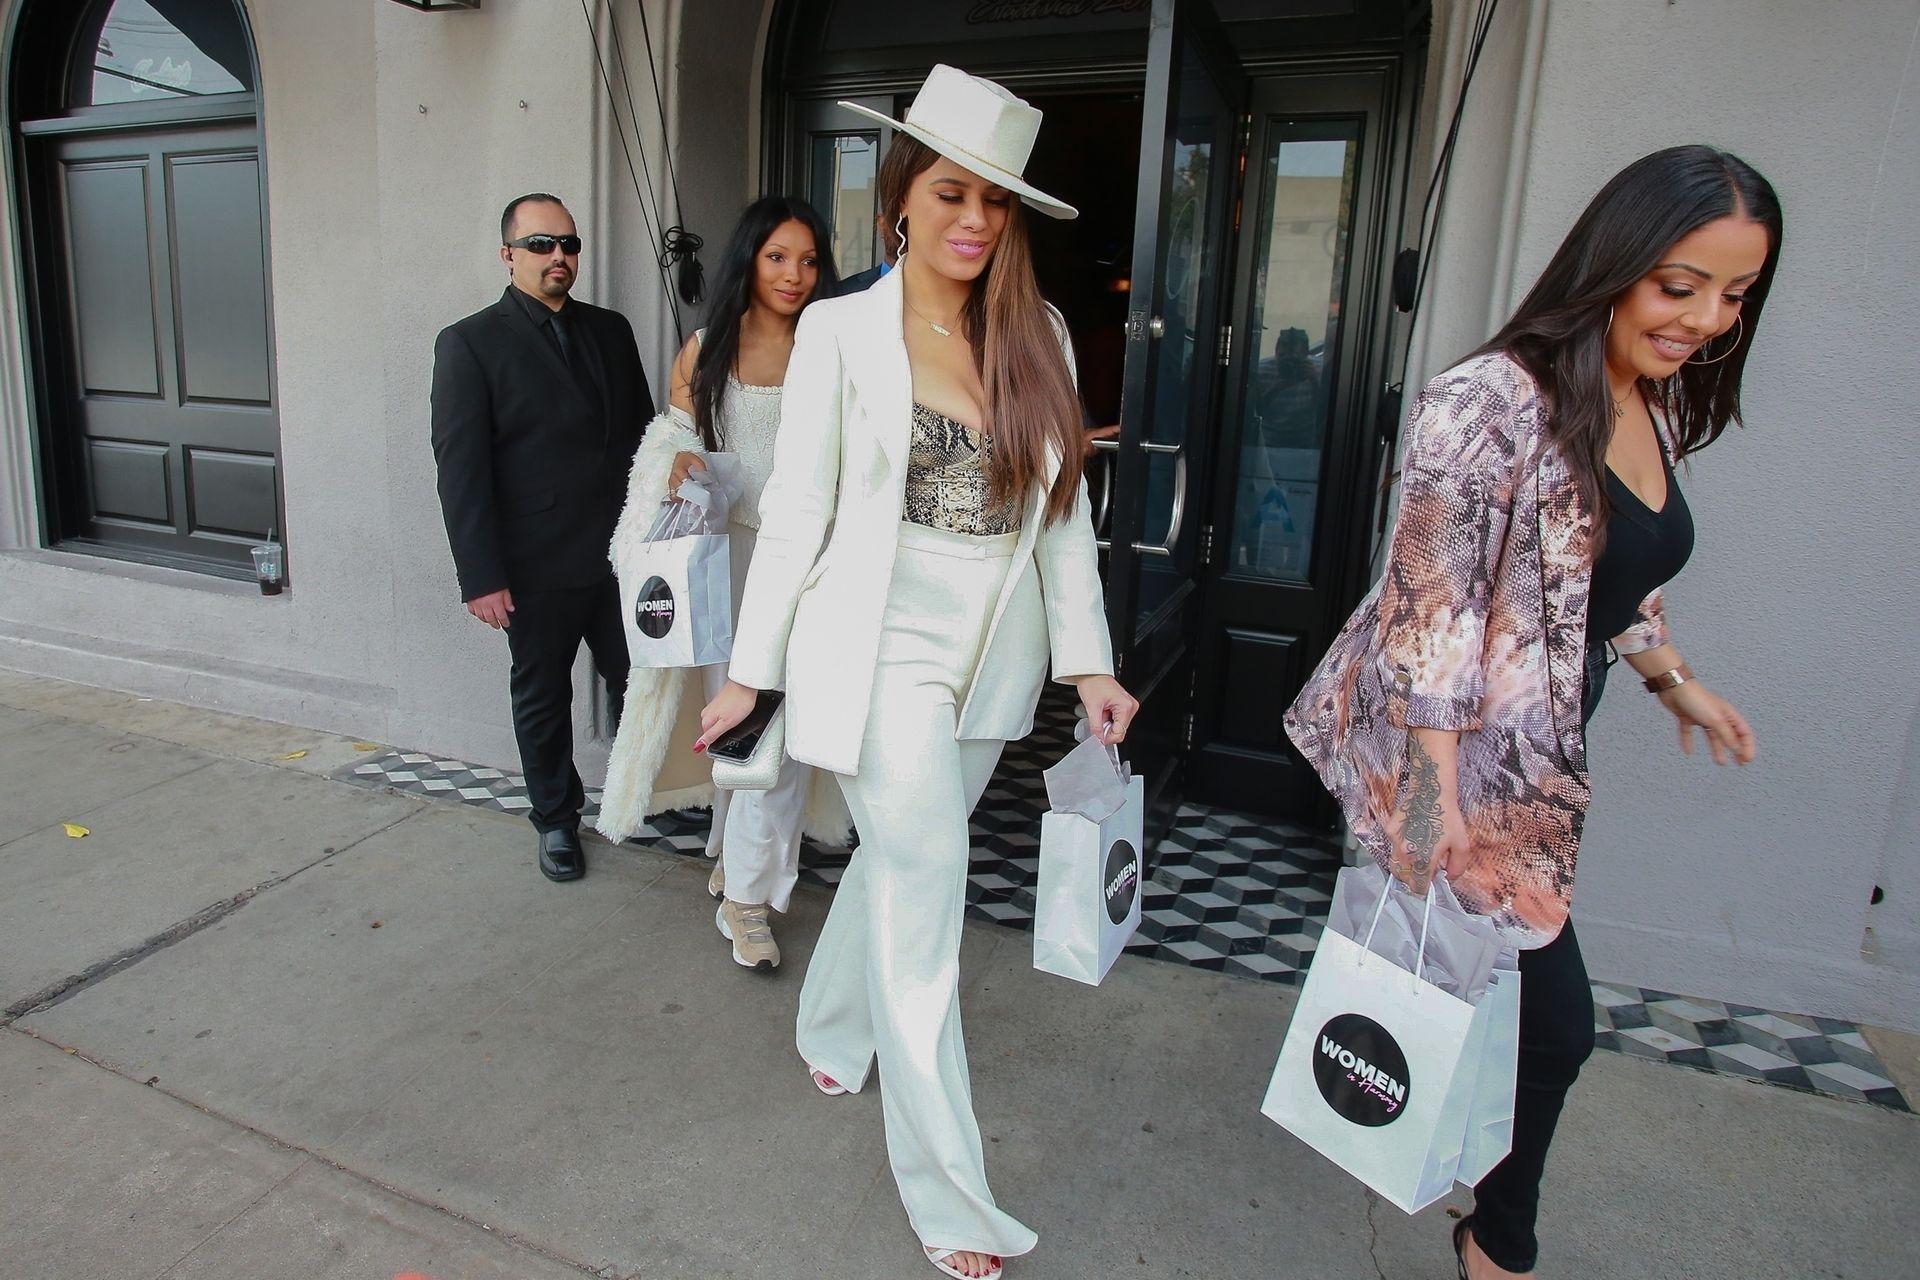 Dinah Jane Departs The Women In Harmony Pre Grammy Luncheon 0011